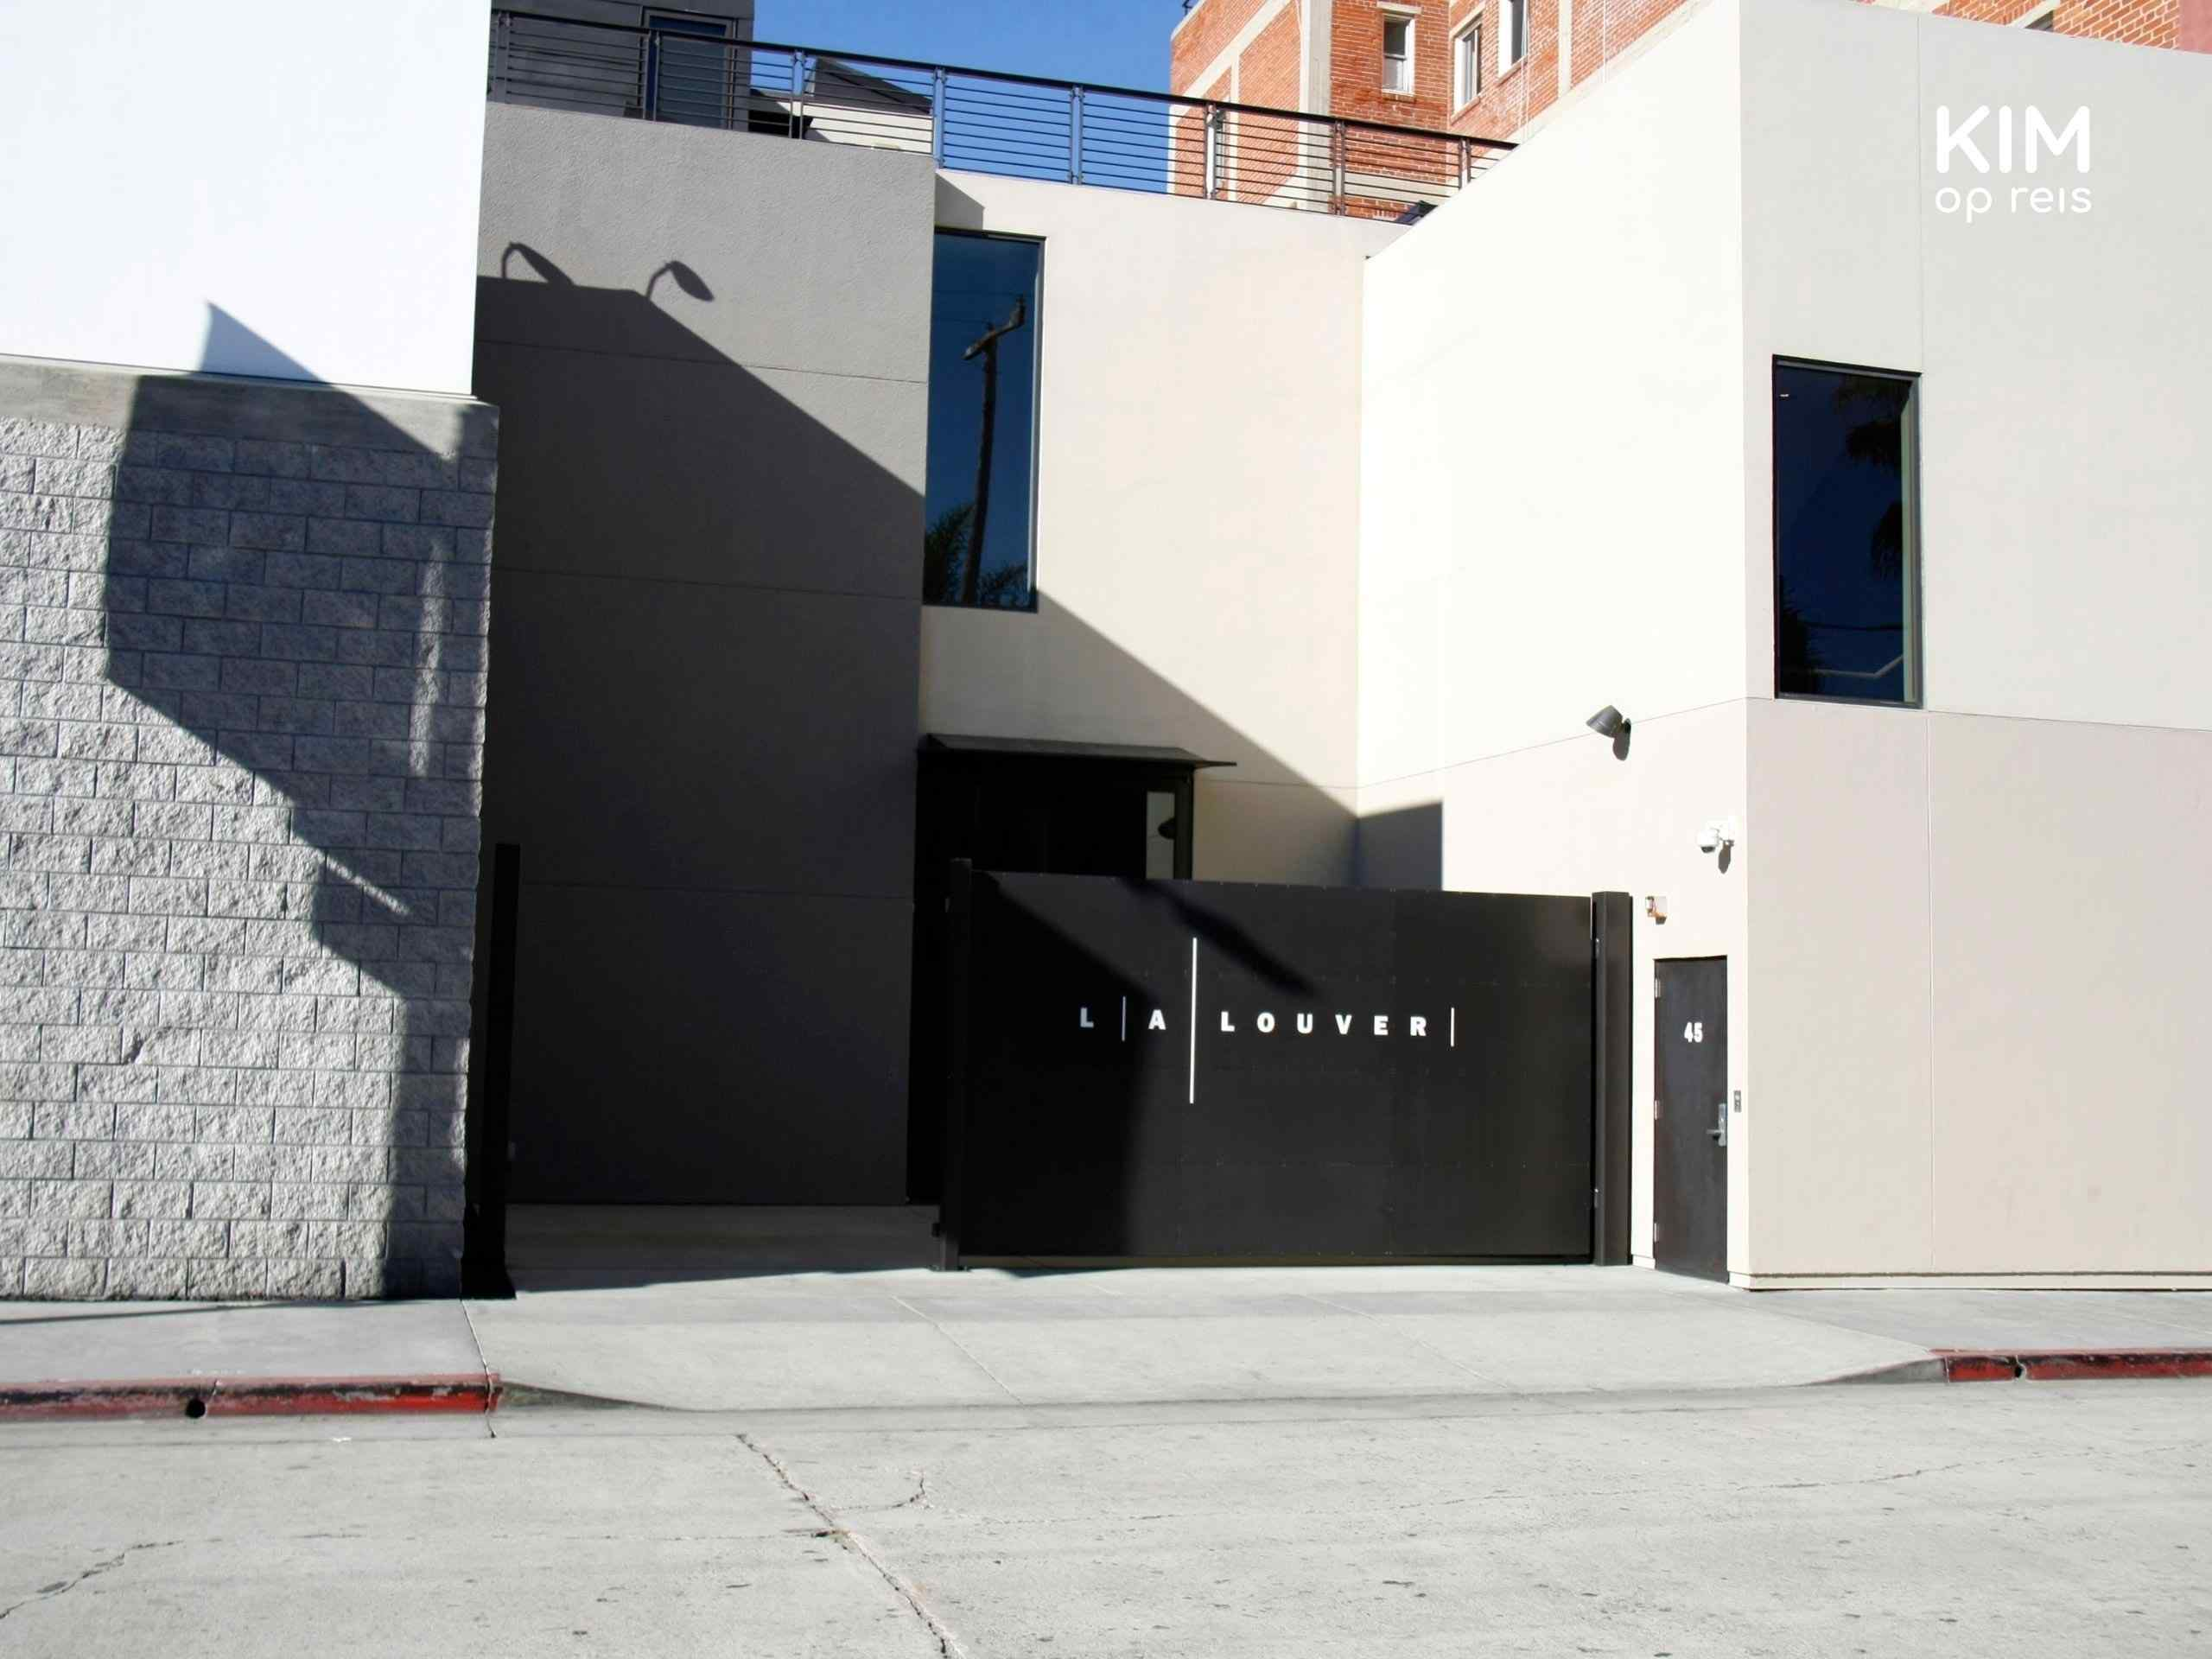 Ingang van L.A. Louver kunstgalerie.